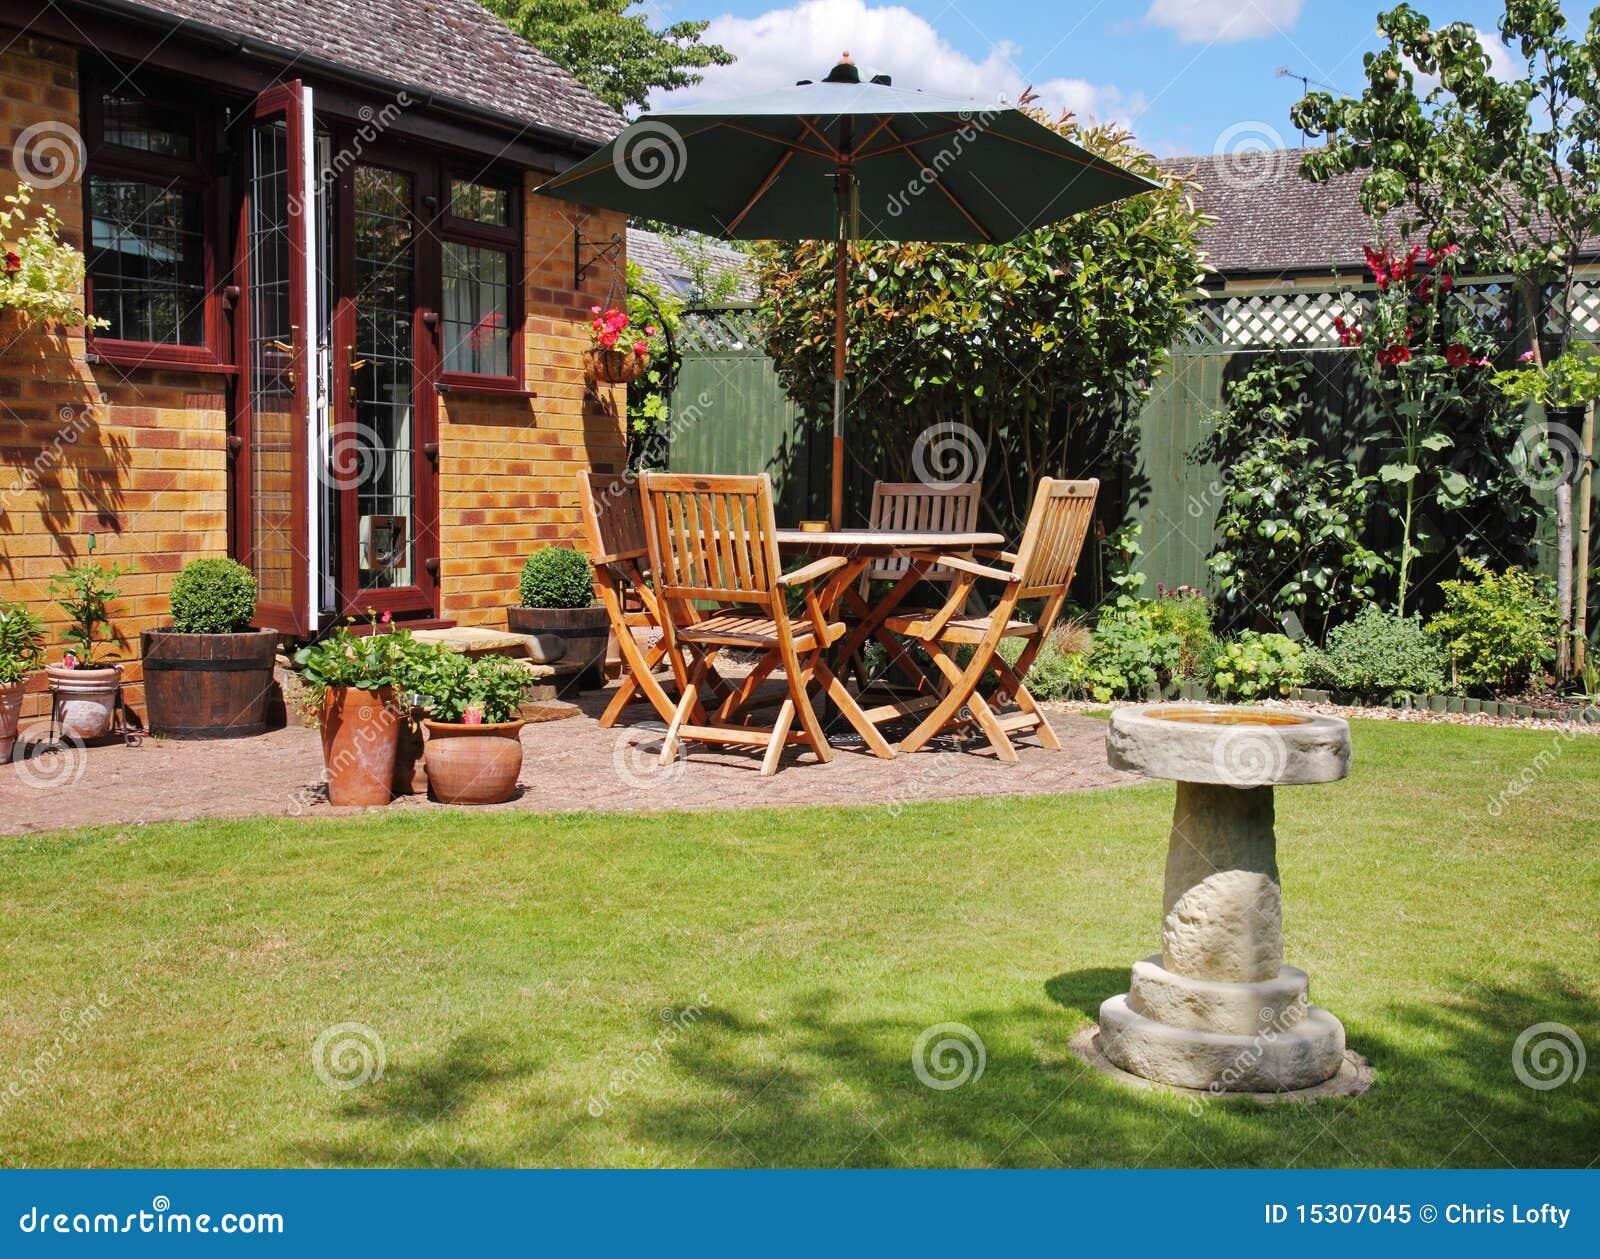 Rea do p tio de um jardim ingl s foto de stock royalty - Patio ingles ...